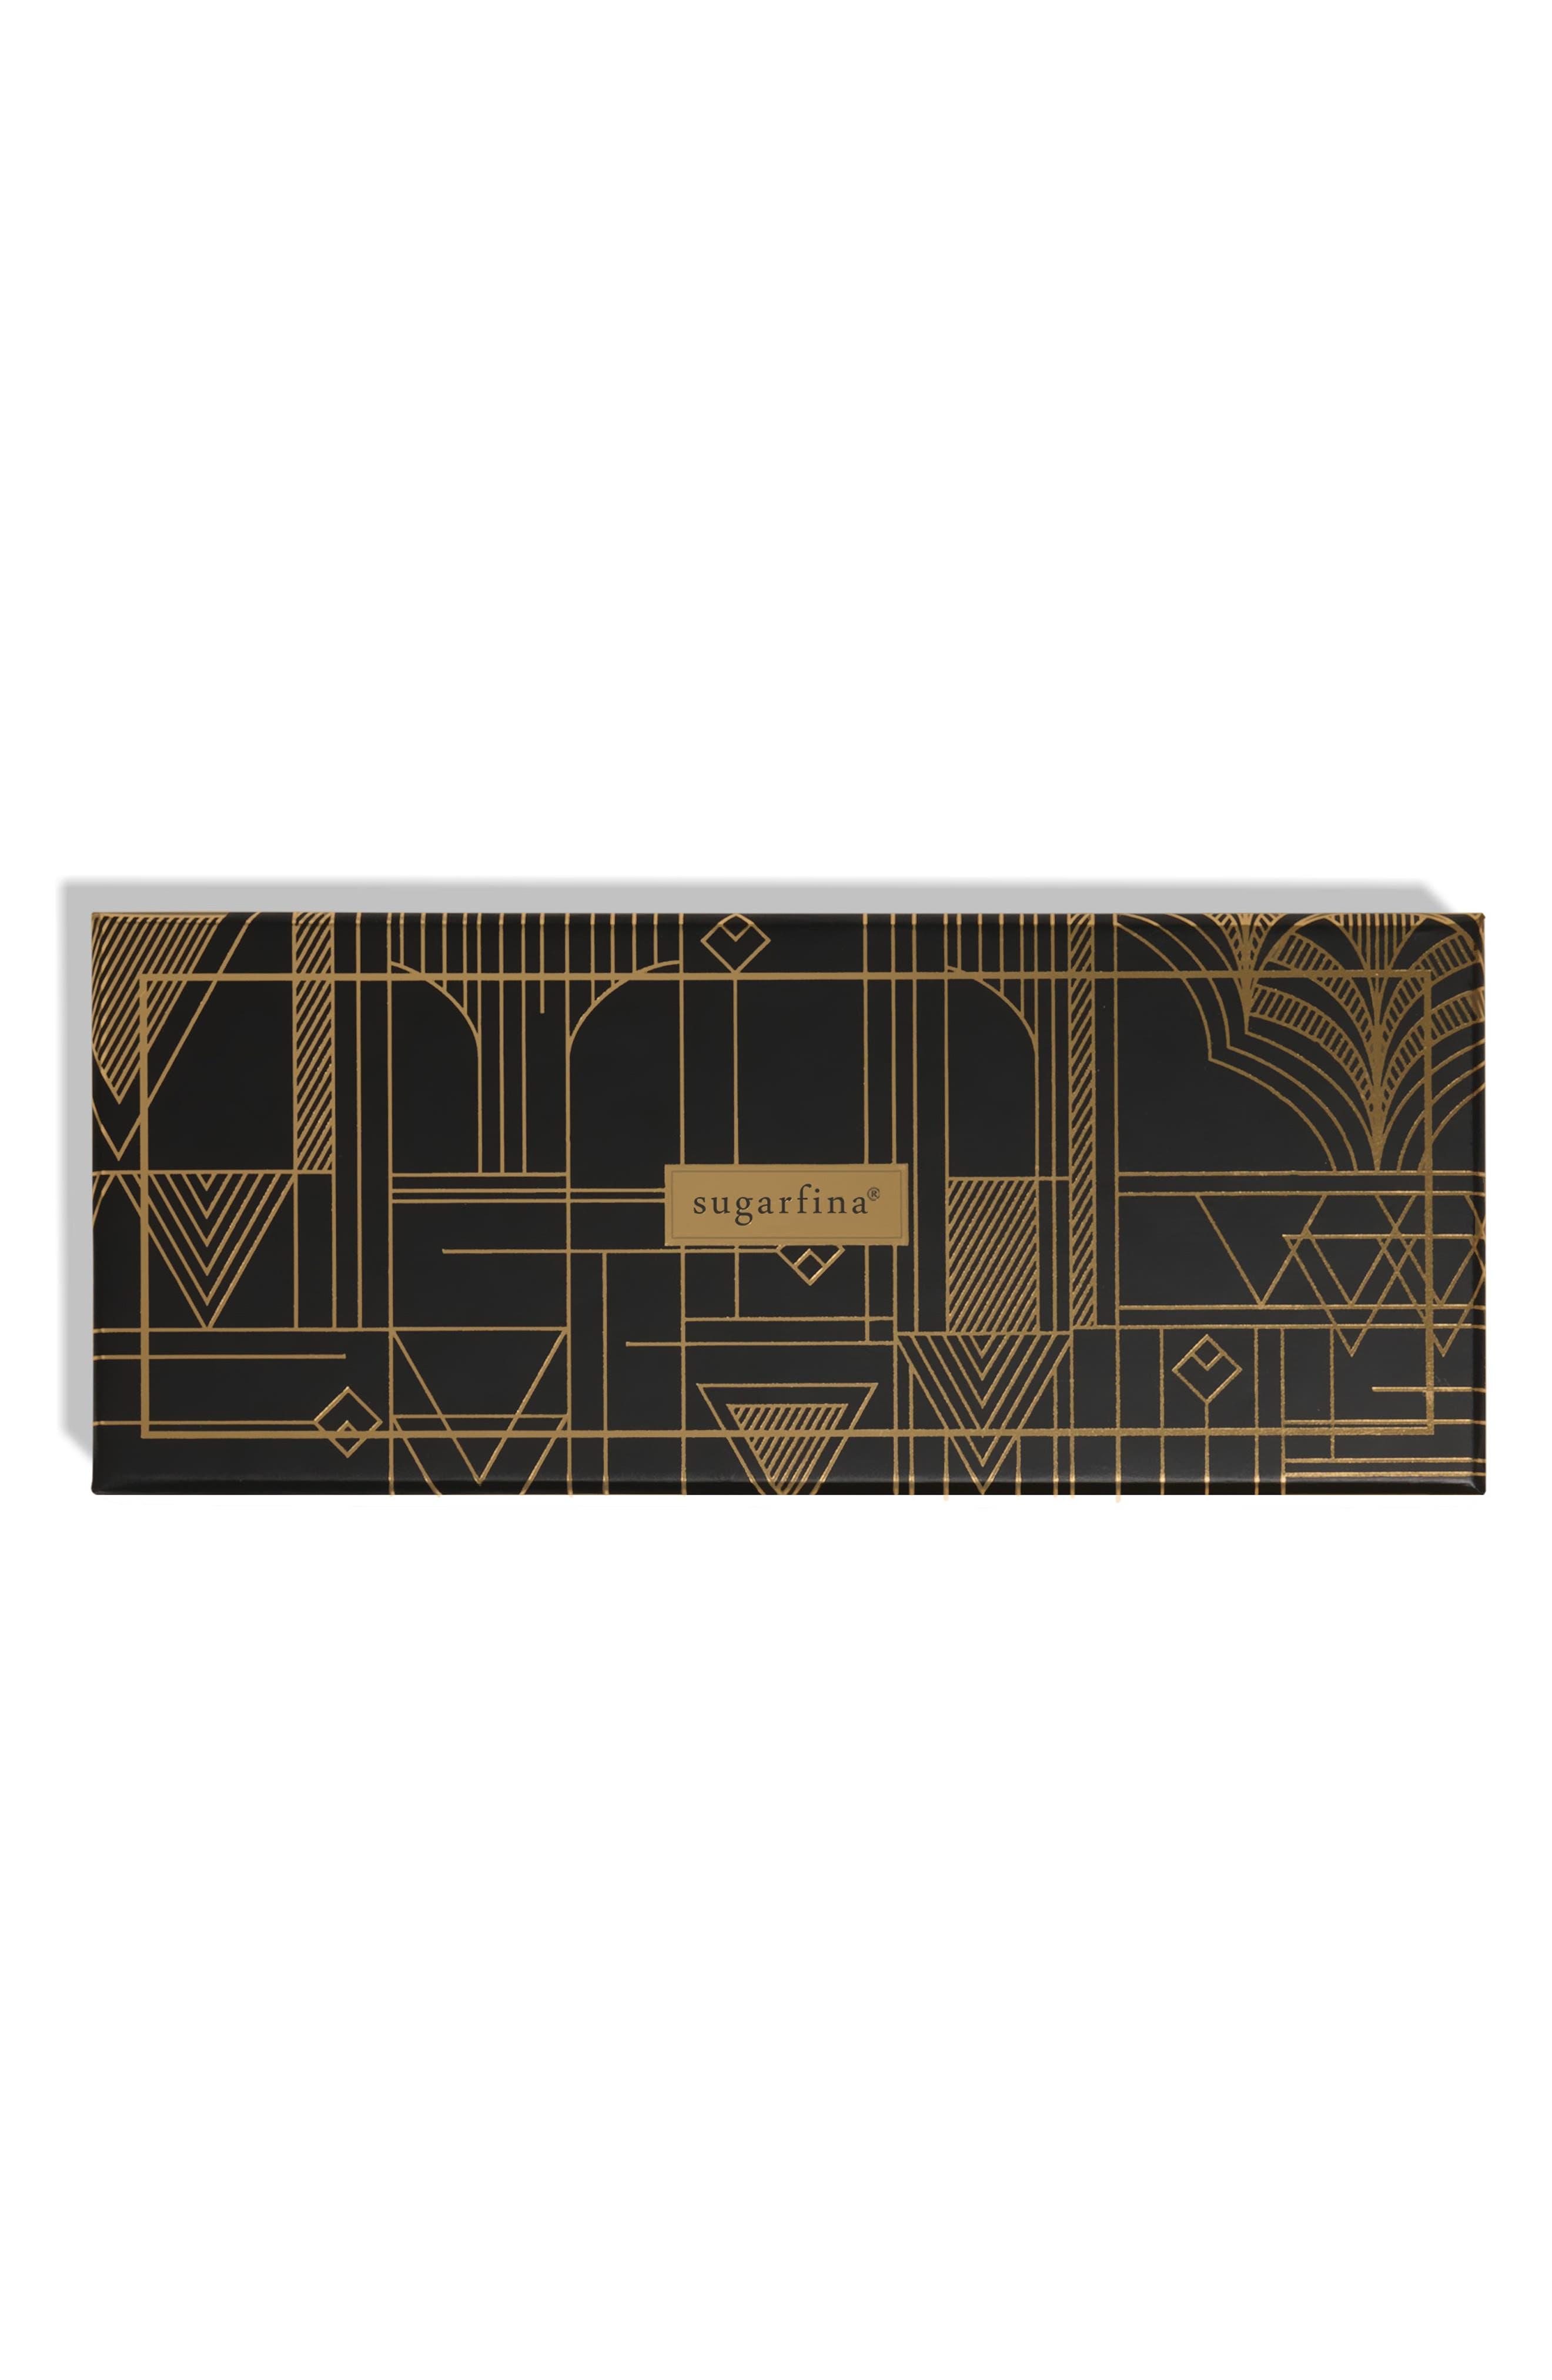 Image of SUGARFINA Vice Retro - 3-Piece Candy Bento Box (Black & Gold) Kit